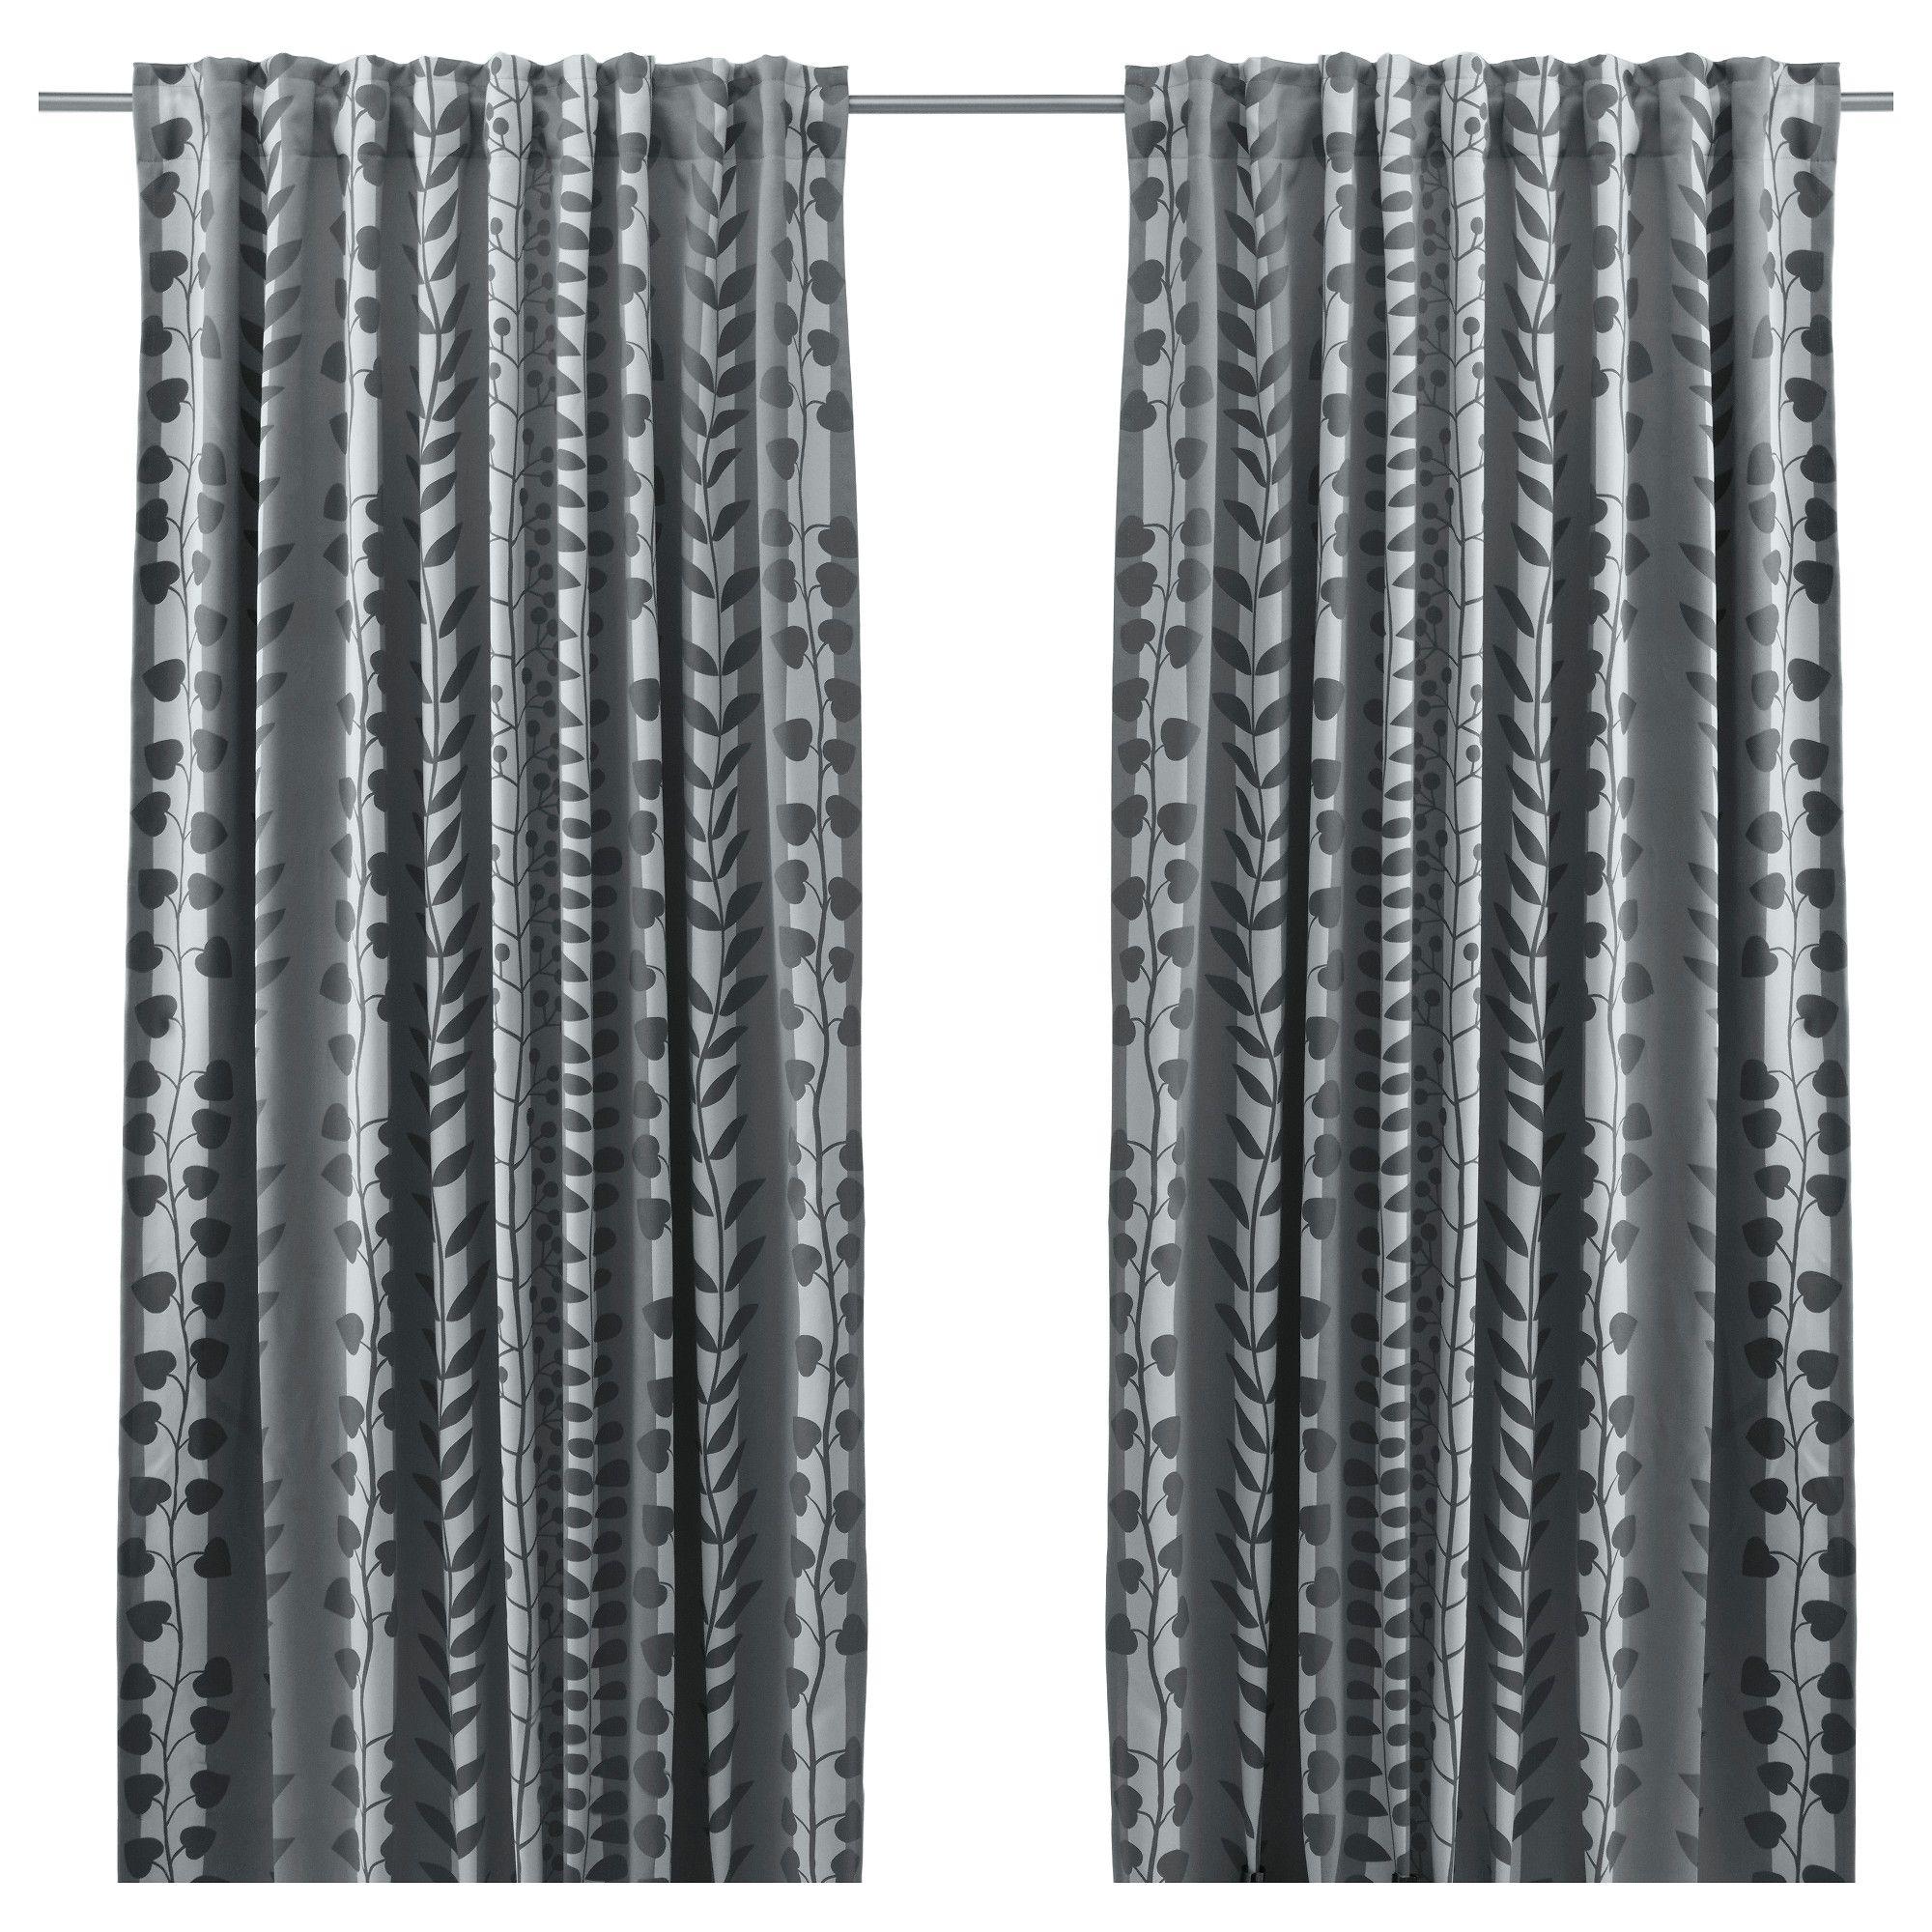 IKEA GUNNI Block out curtains 1 pair The curtains prevent